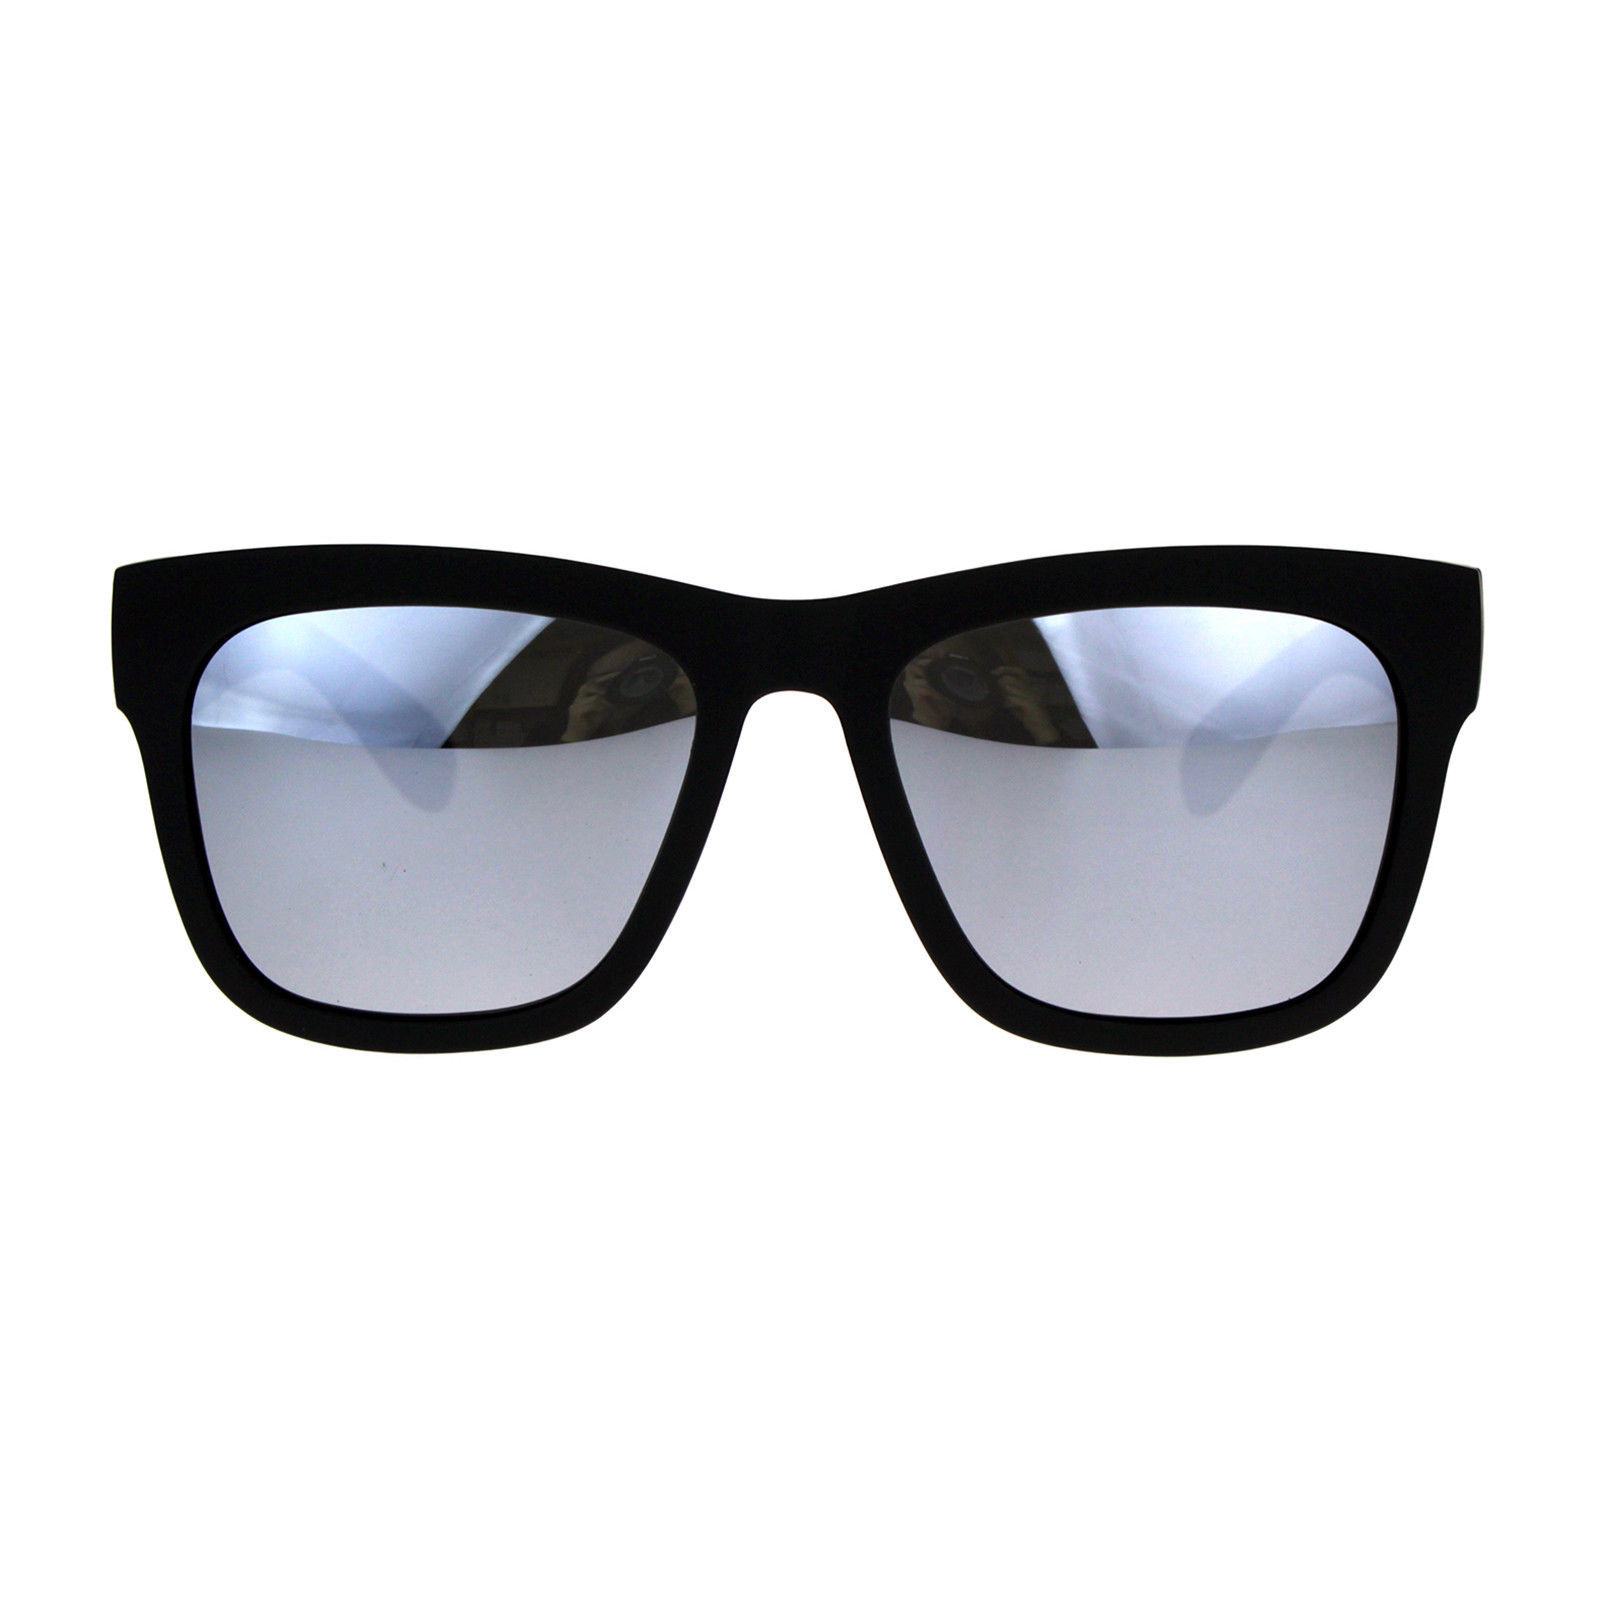 PASTL Sunglasses Polarized Lens Soft Matted Black Square Frame Unisex